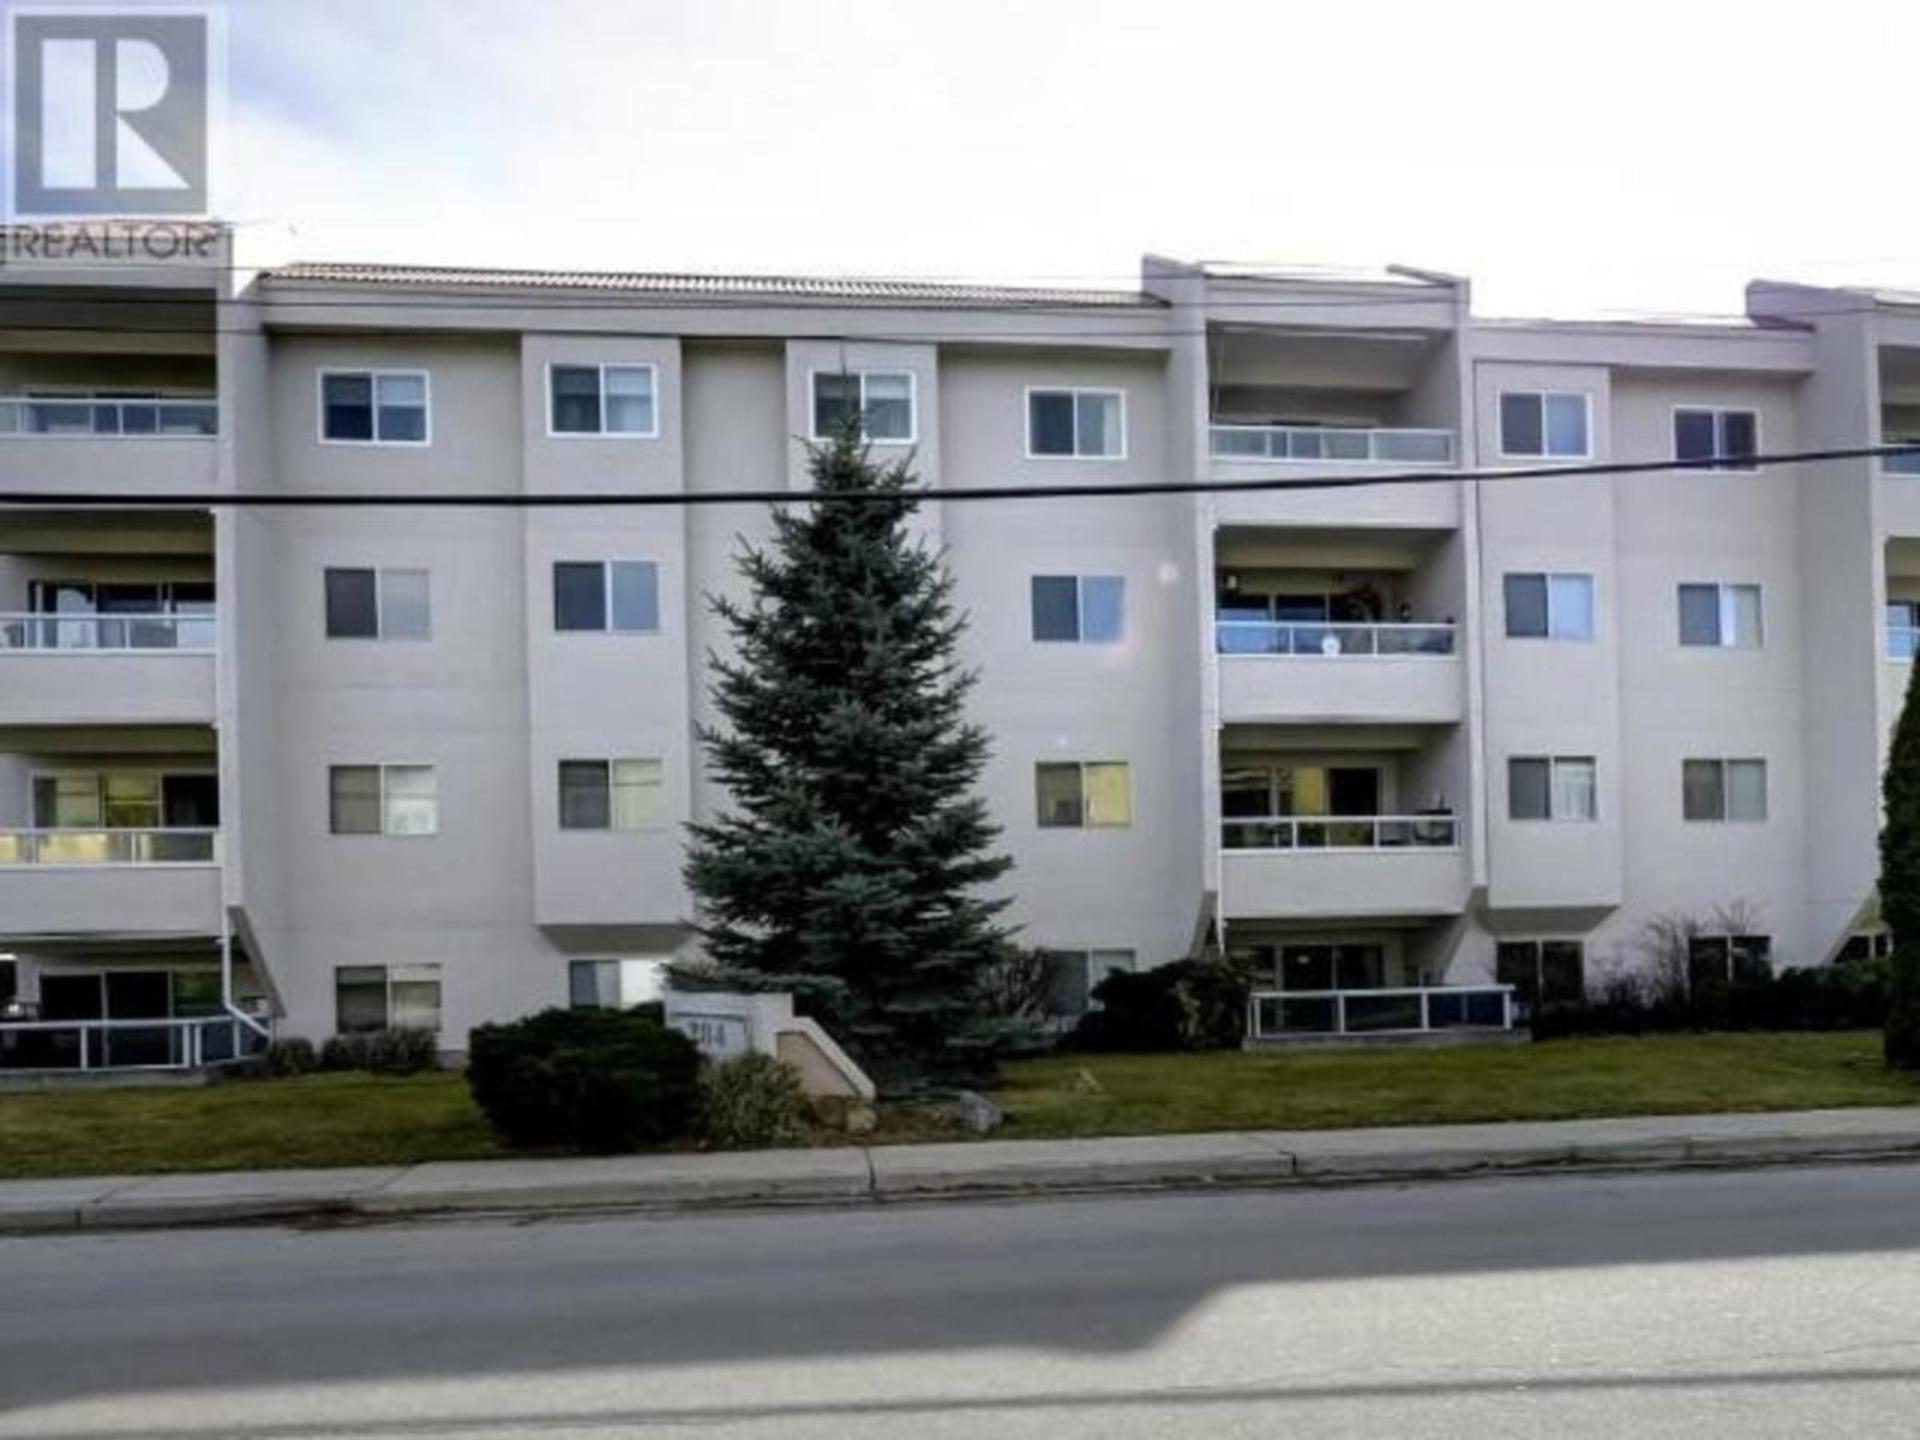 307 - 284 Yorkton Avenue, Main South, Penticton